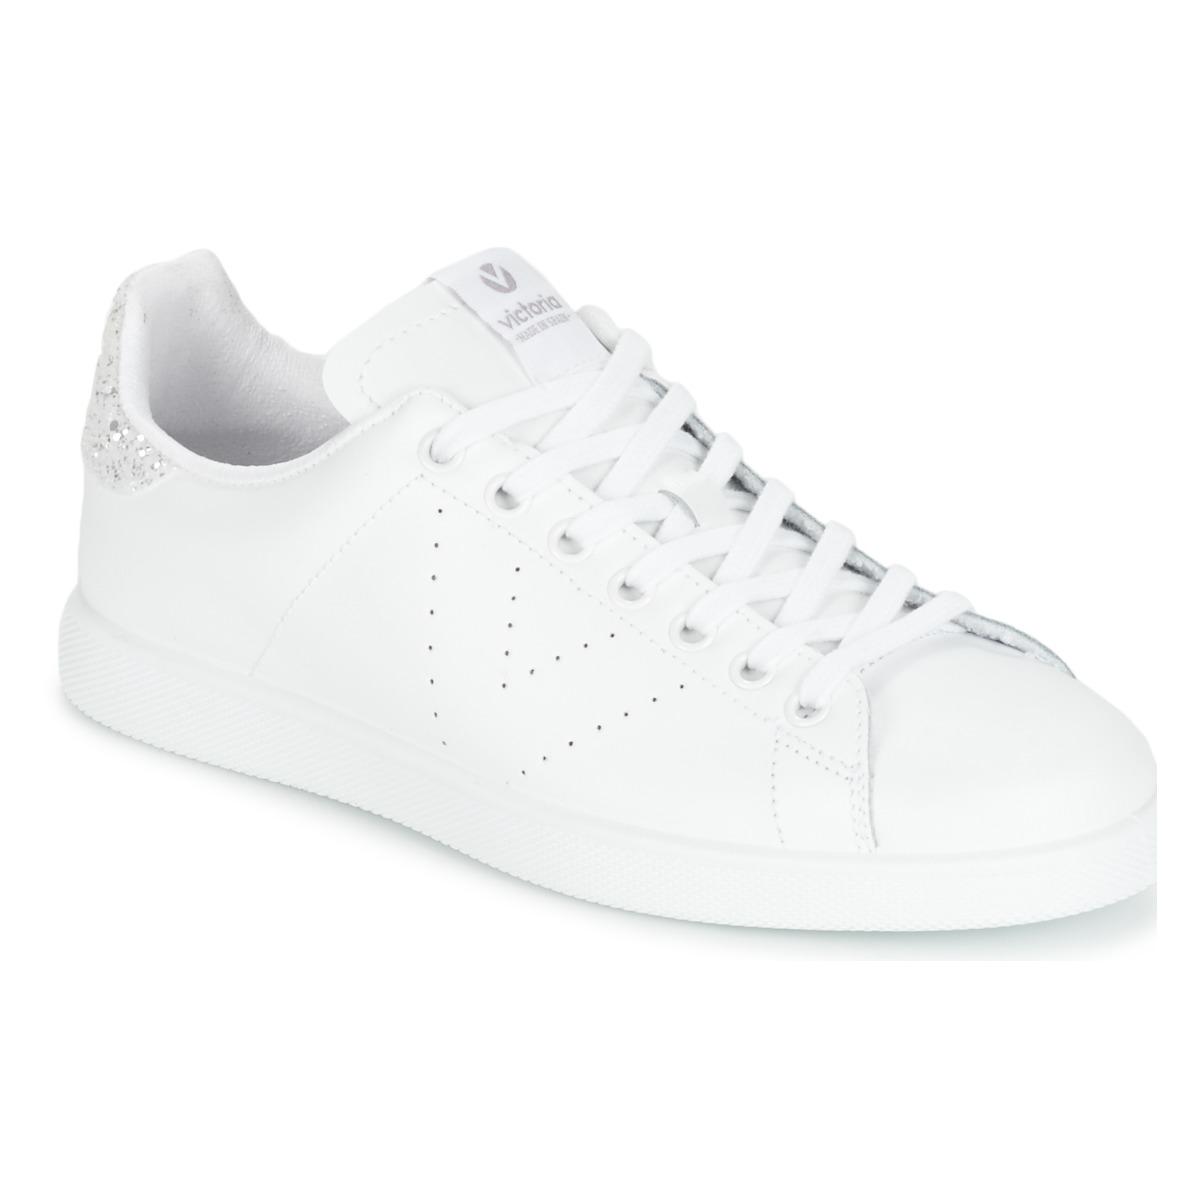 victoria deportivo basket piel blanc argent chaussure pas cher avec chaussures. Black Bedroom Furniture Sets. Home Design Ideas